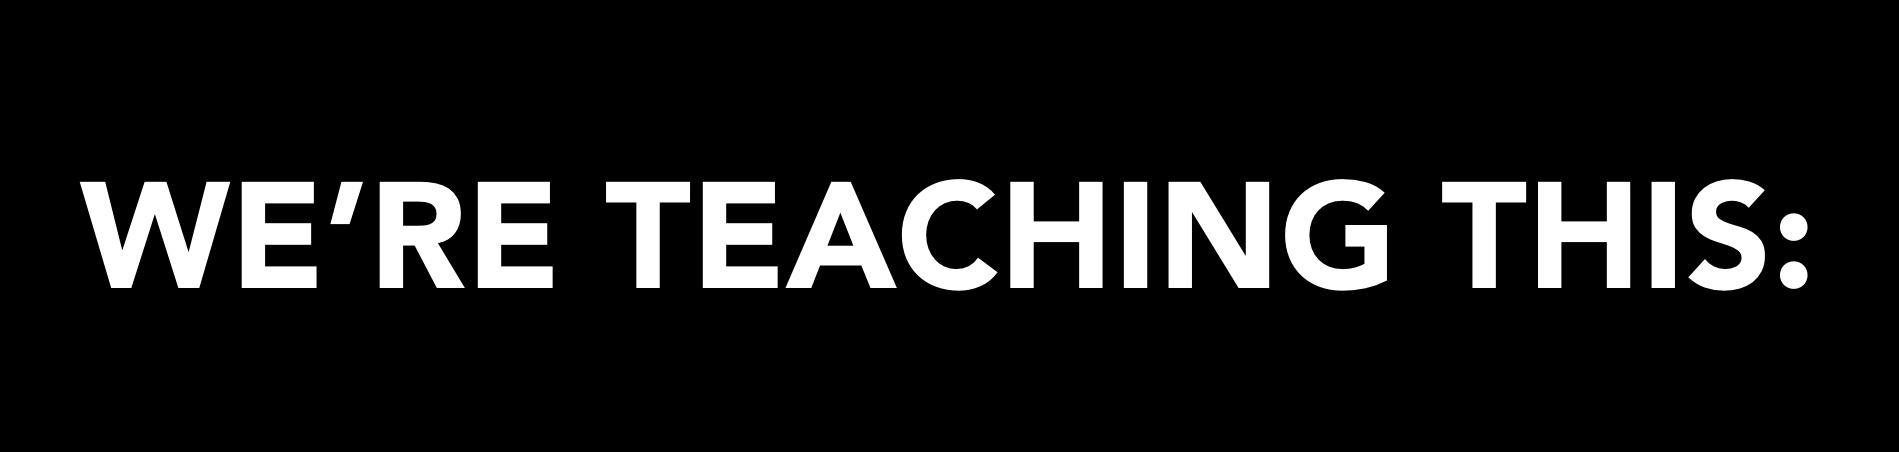 We're Teaching This: